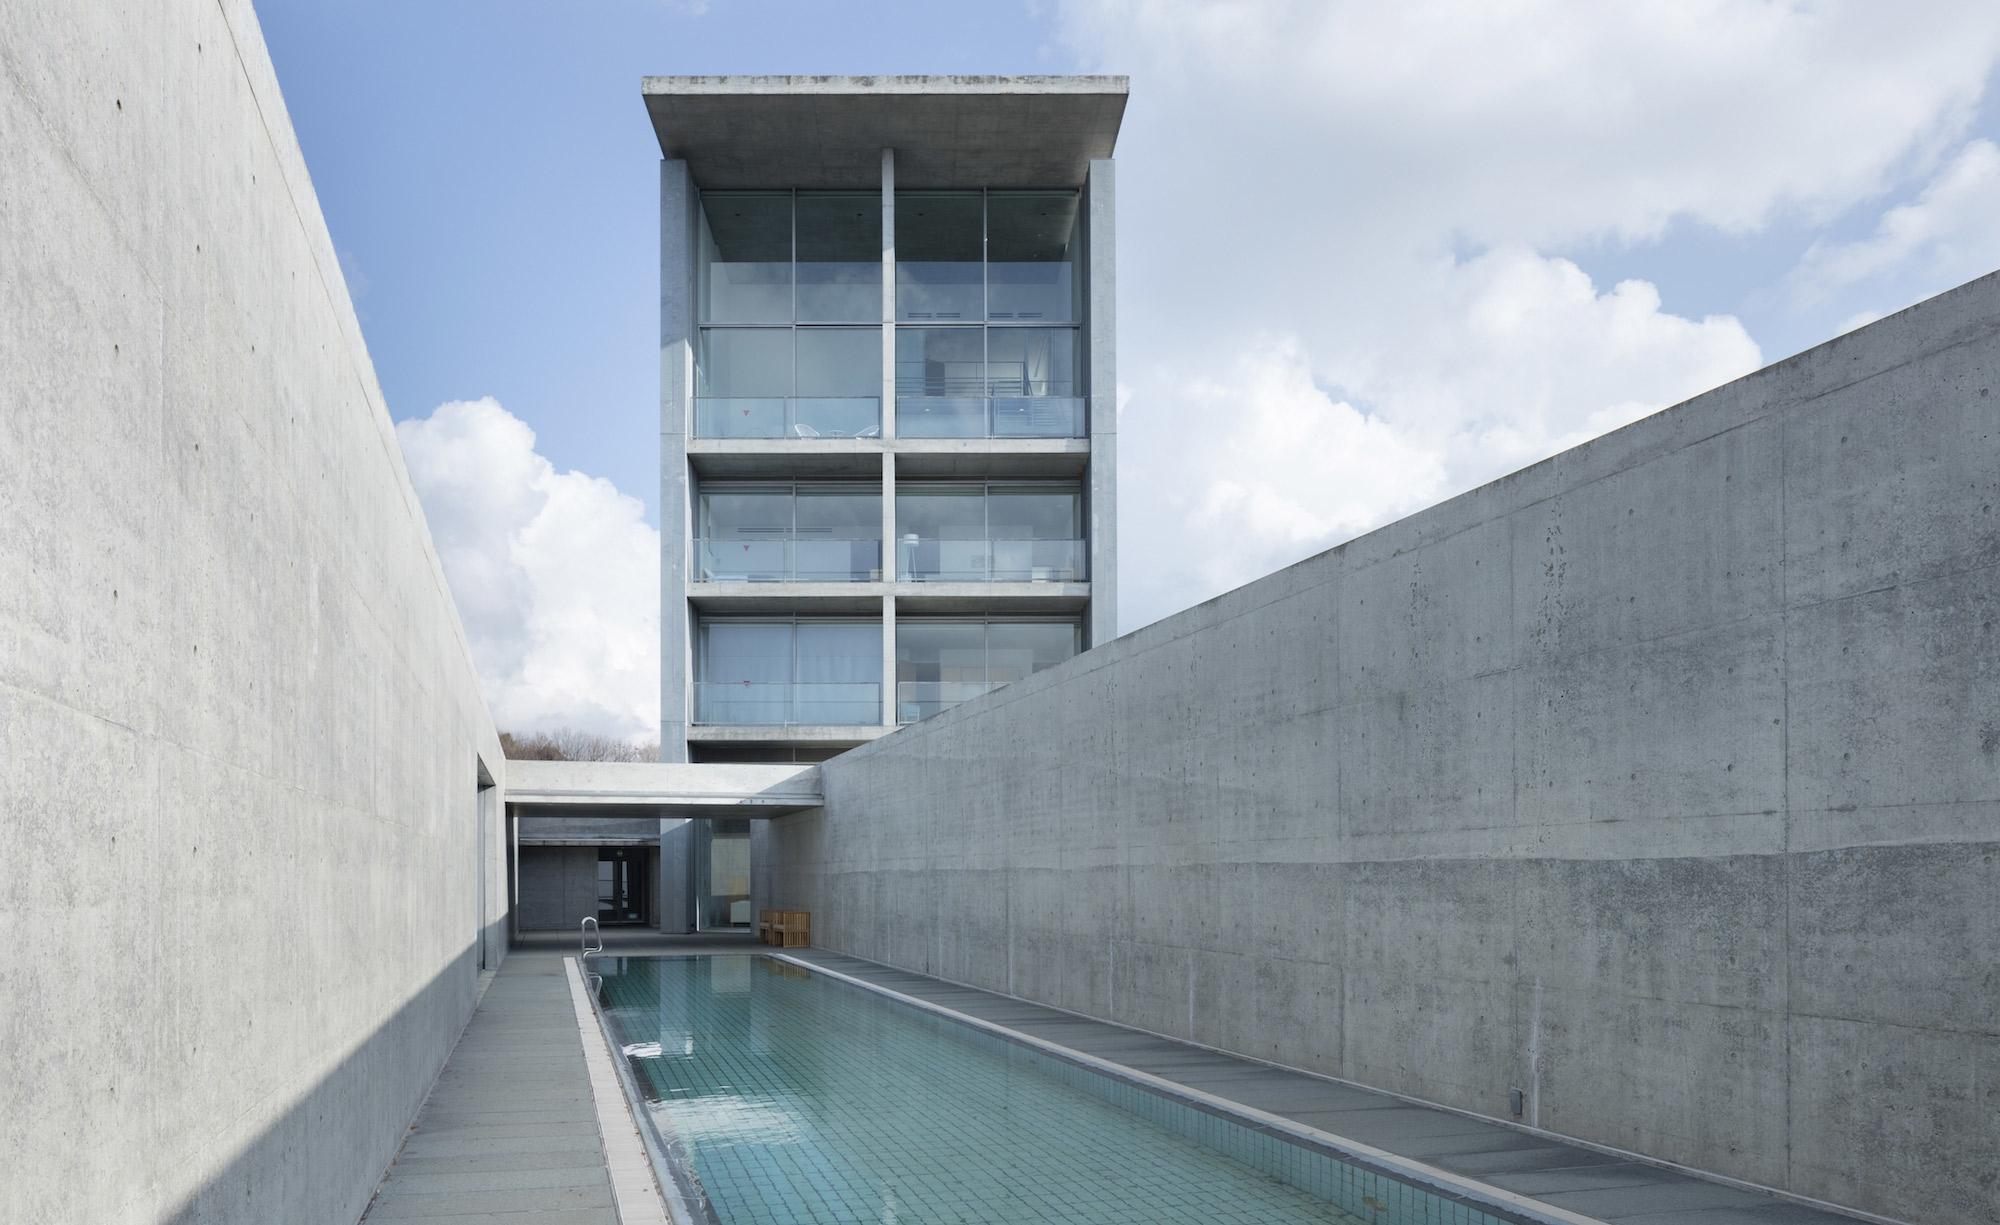 Tadao-Ando-Setouchi-Aonagi_3.jpg